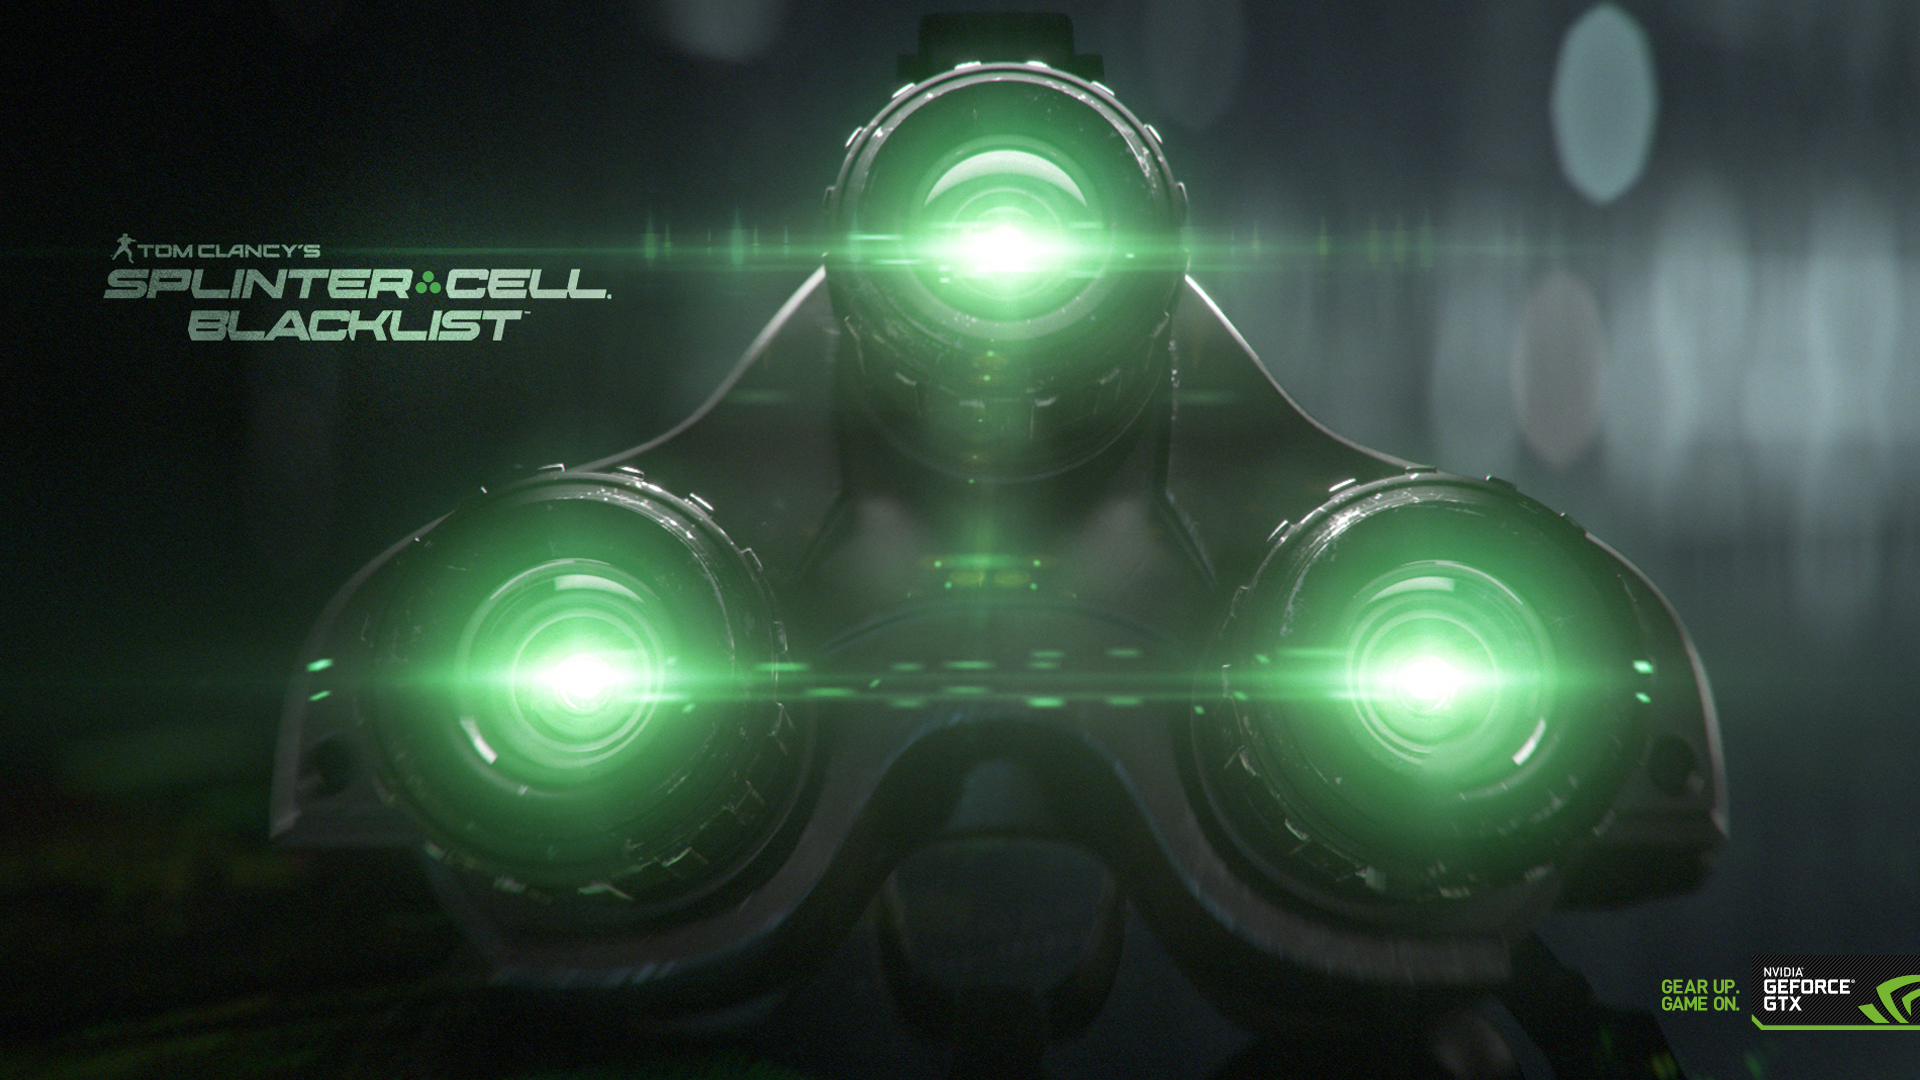 Clancys Splinter Cell Blacklist Wallpaper Now Available GeForce 1920x1080